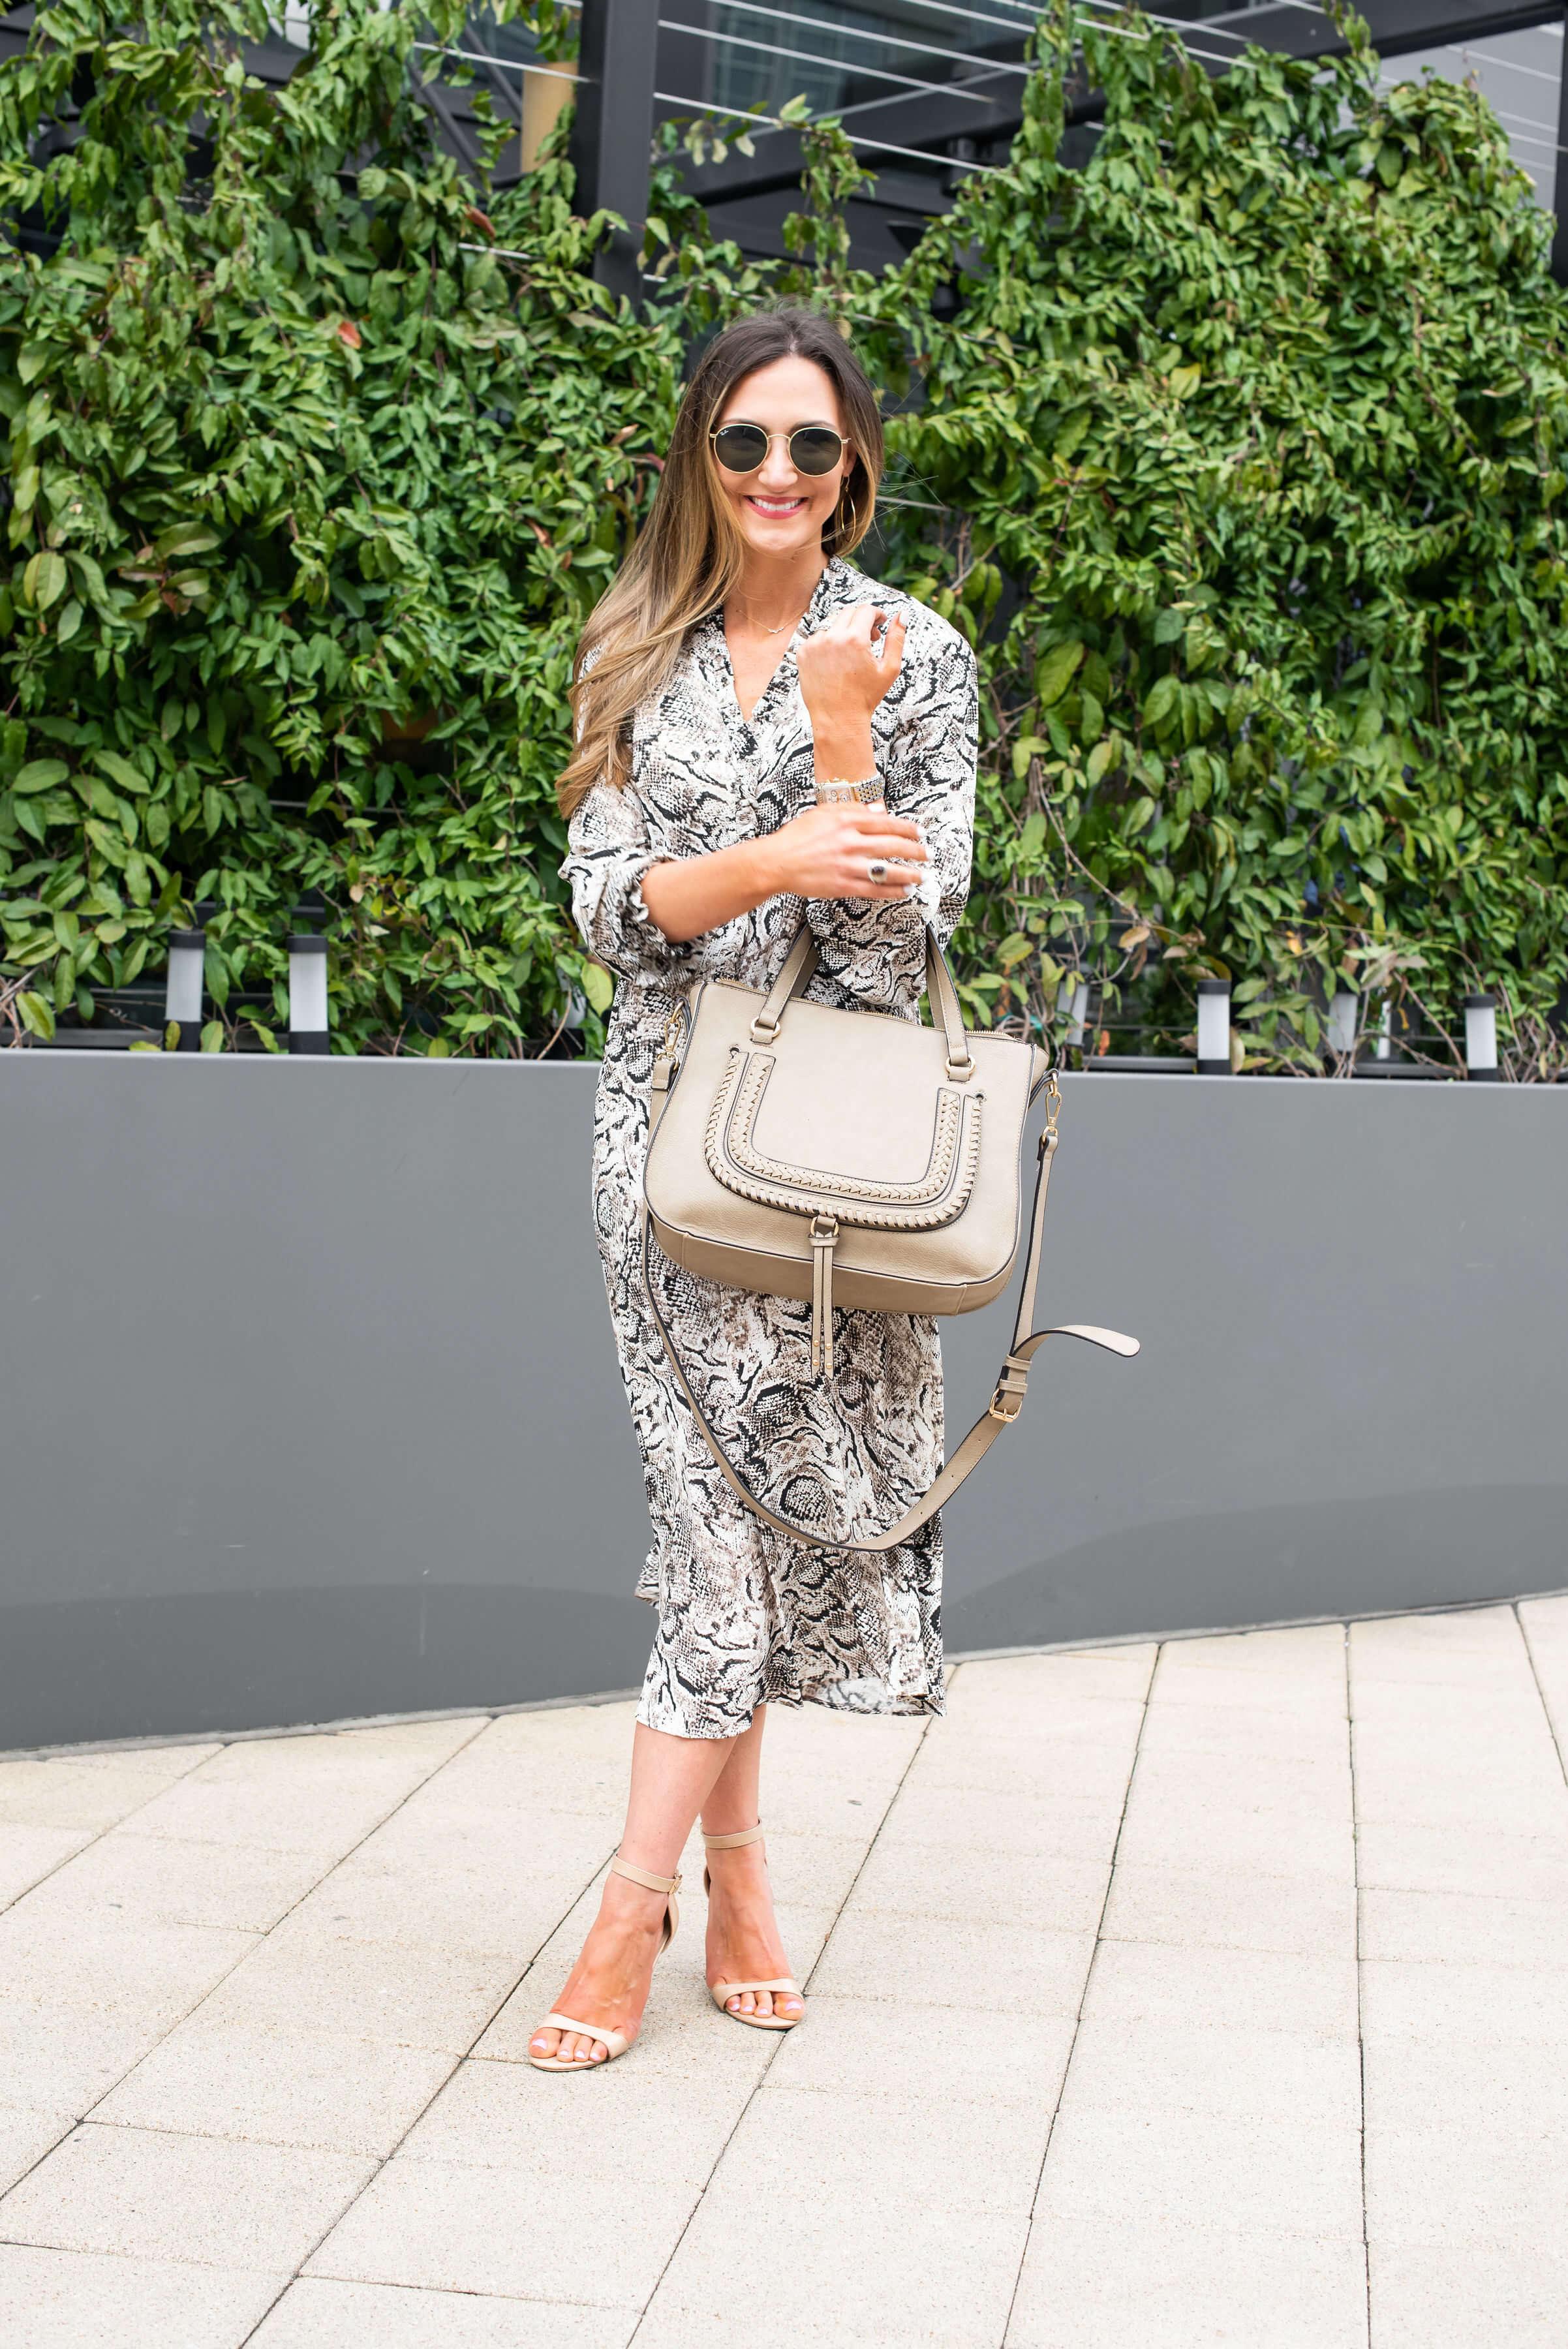 snake skin midi dress from Marks and Spencer | Style Your Senses Blog